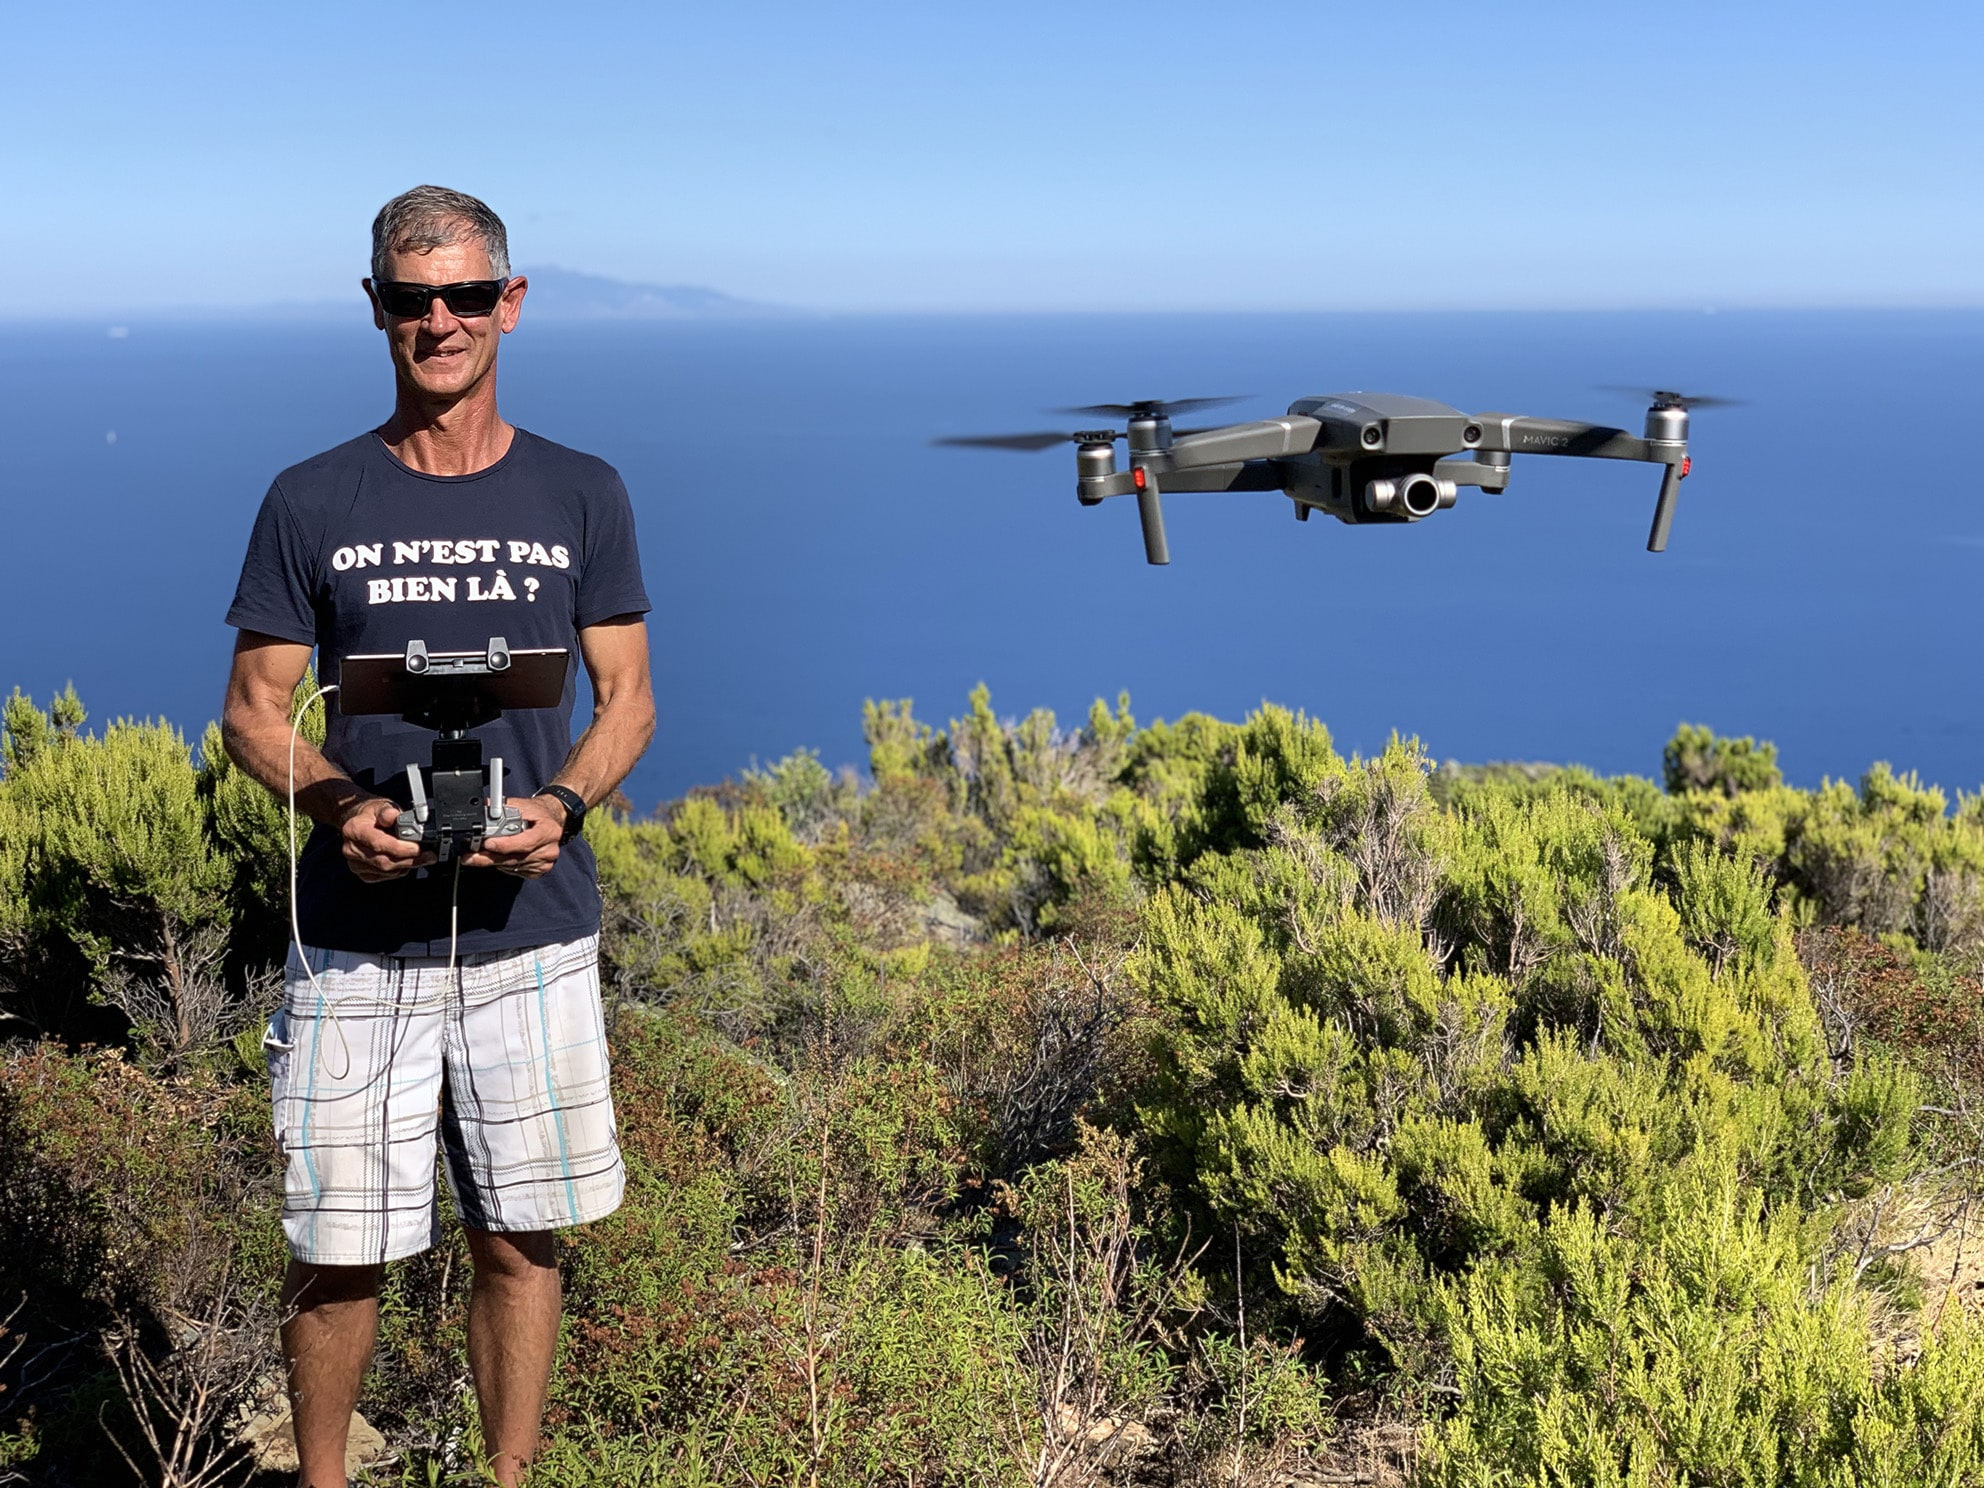 formation-drone-lieu-paradisiaque-Corse-min